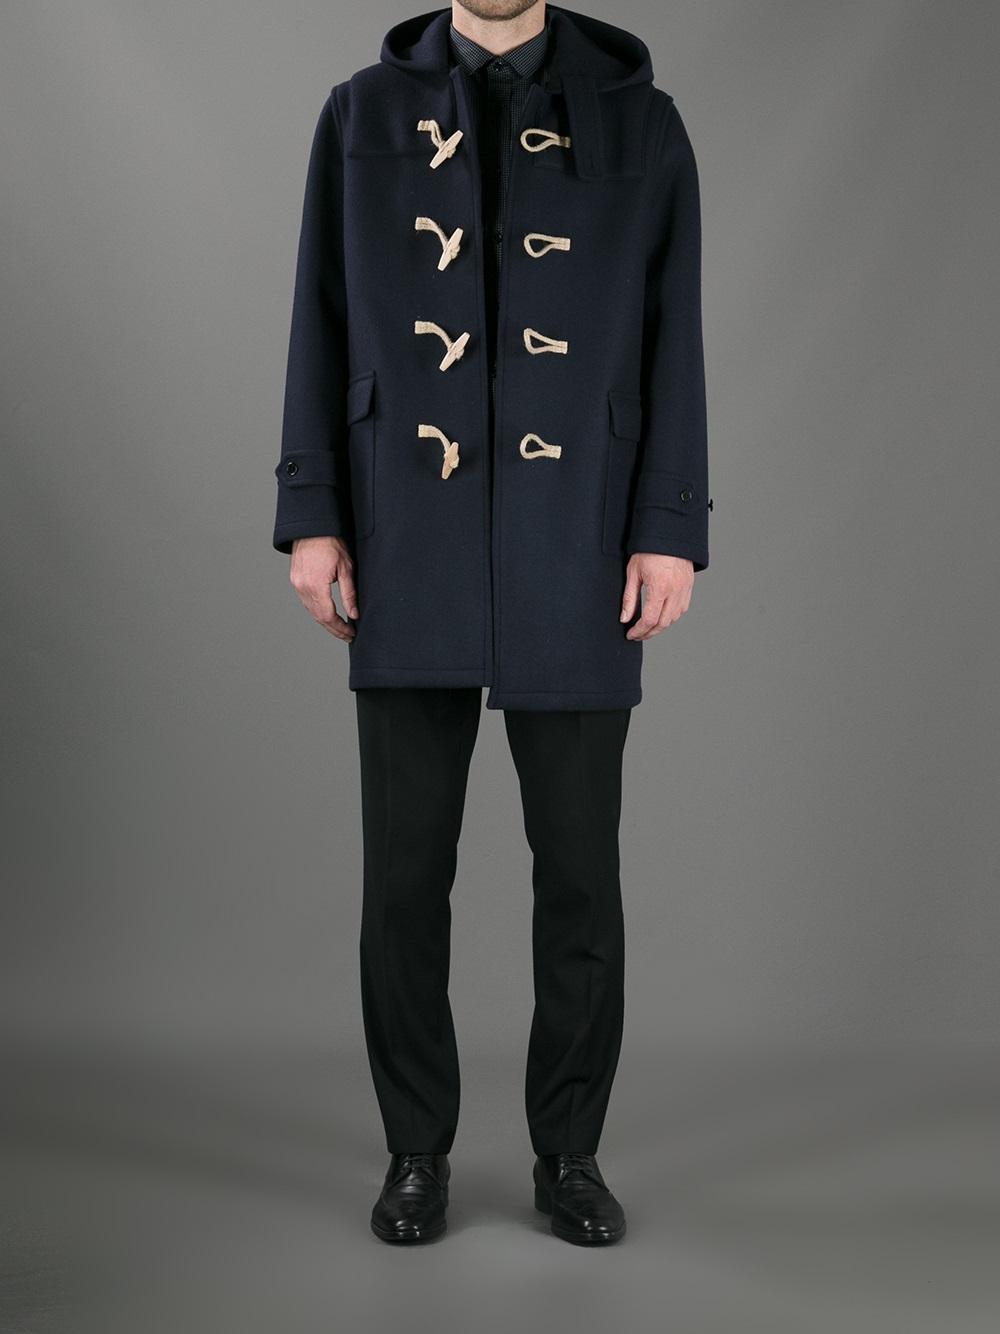 Saint laurent Hooded Duffle Coat in Blue for Men | Lyst